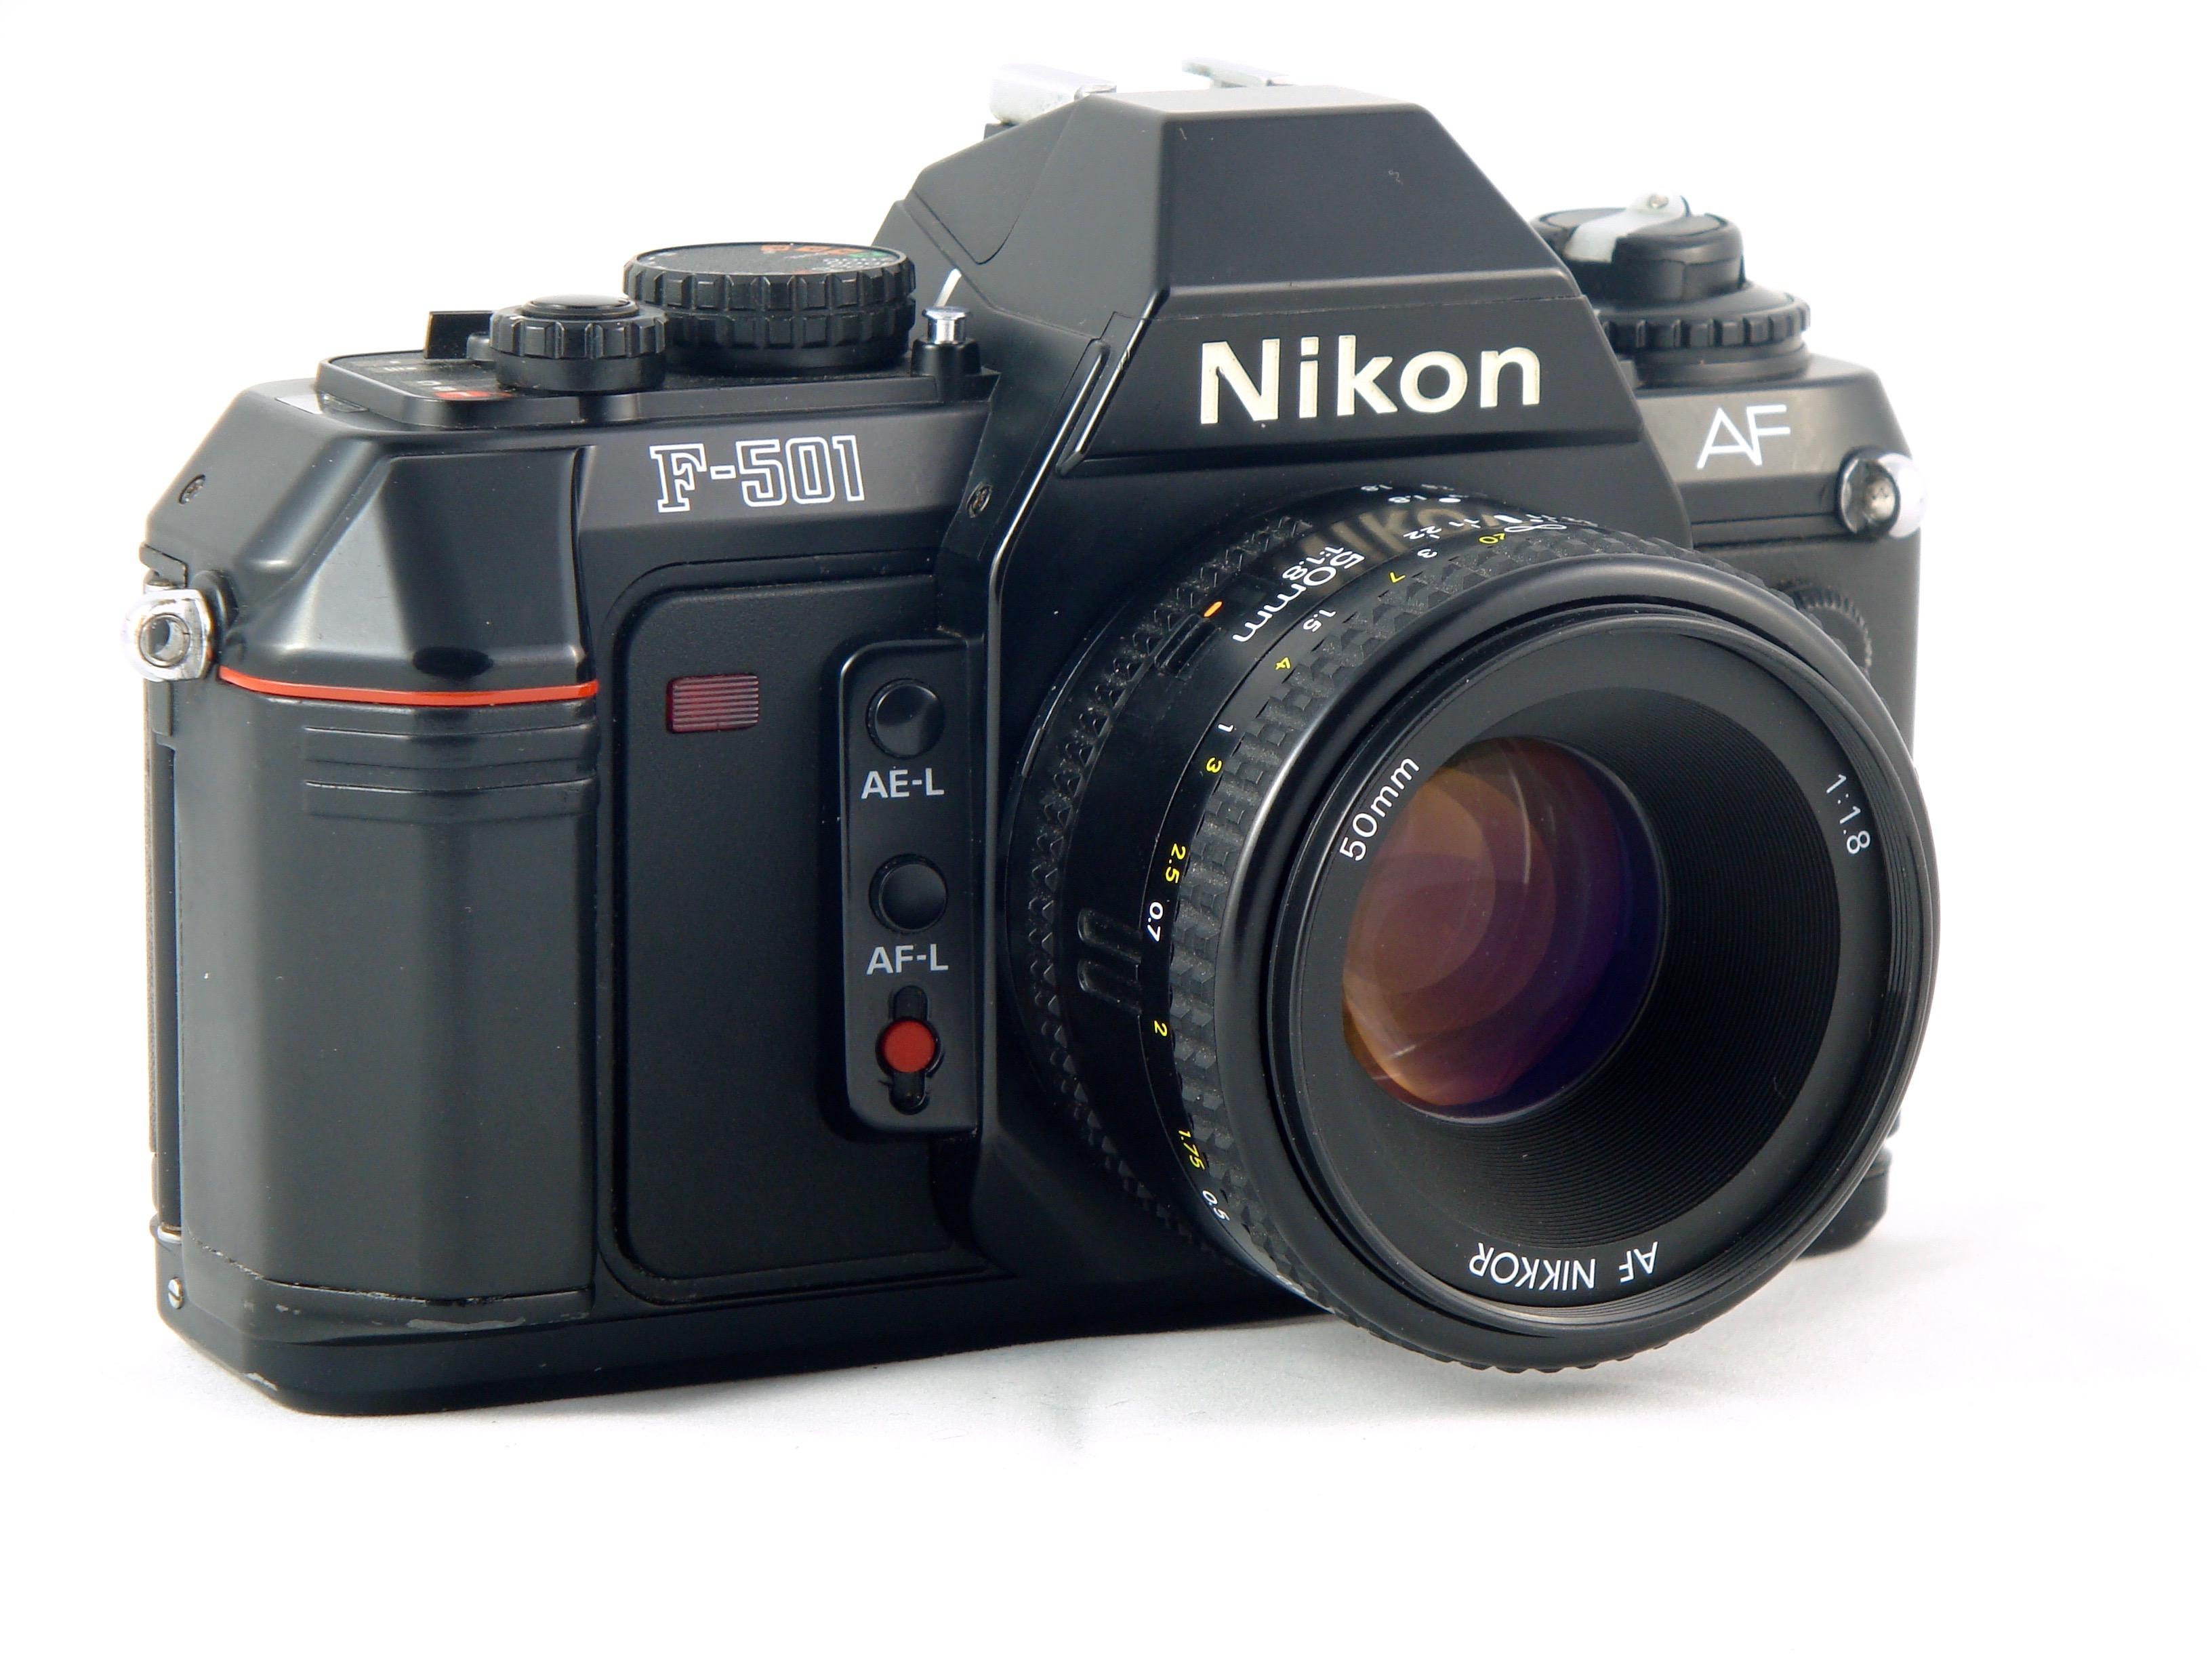 a camera the nikon f 501 af manondamoon s blog rh manondamoon com Nikon D90 Guide Nikon Binders